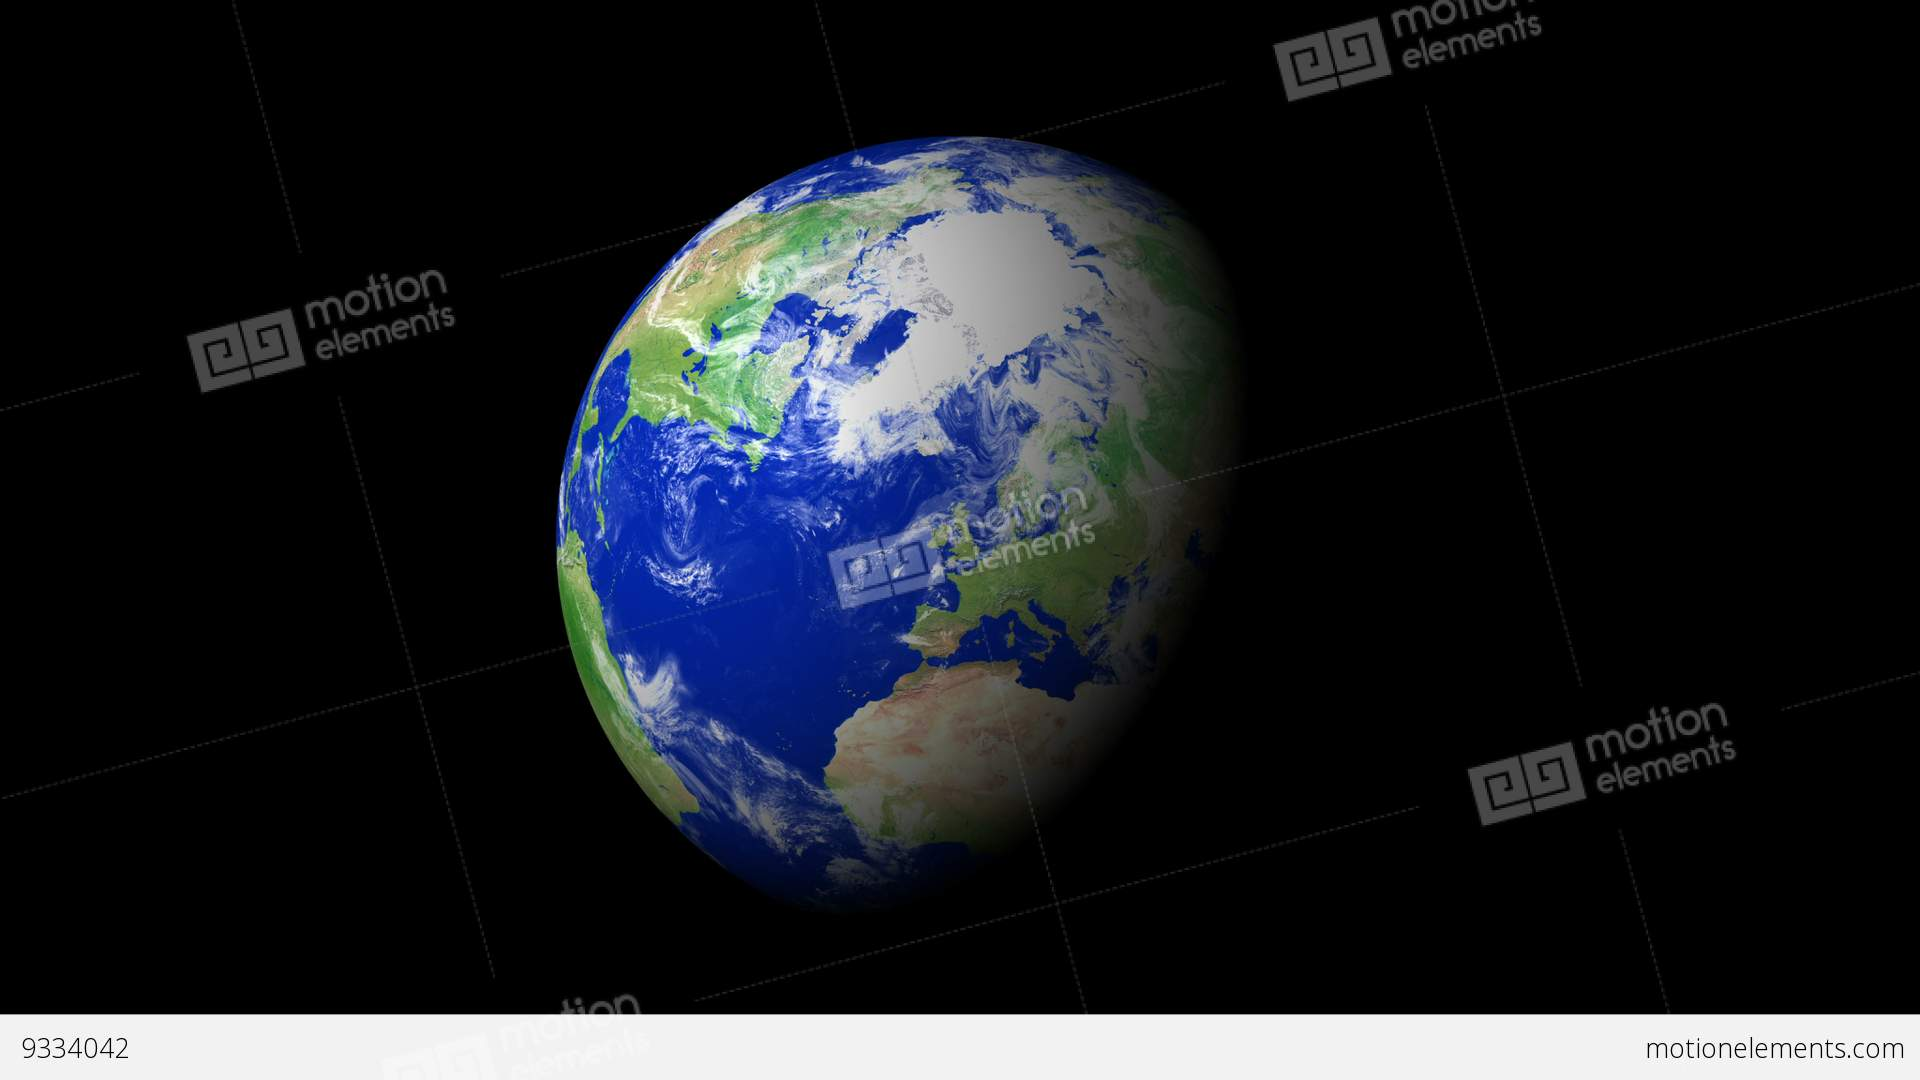 4k earth zoom liverpool england stock animation 9334042 4k earth zoom liverpool england stock video footage gumiabroncs Image collections